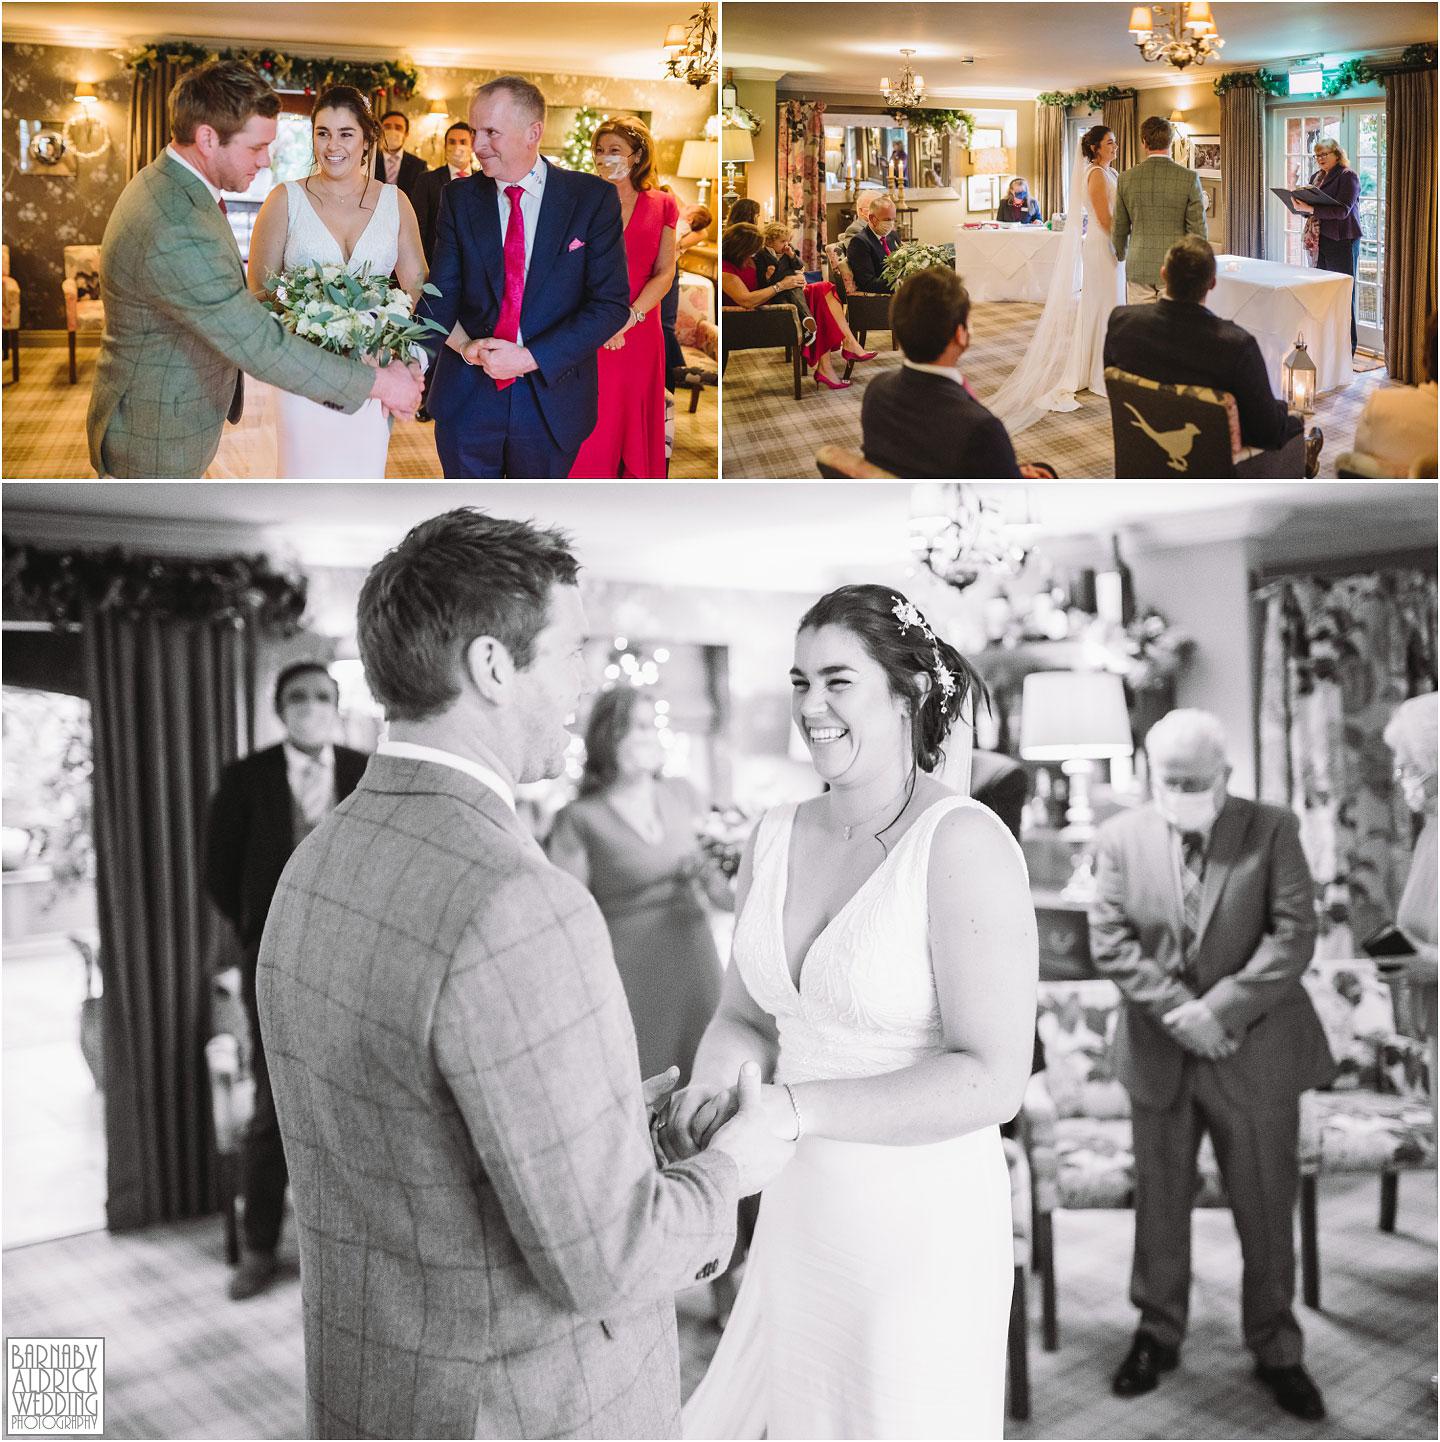 Civil wedding ceremony at The Pheasant harome, lockdown 2020